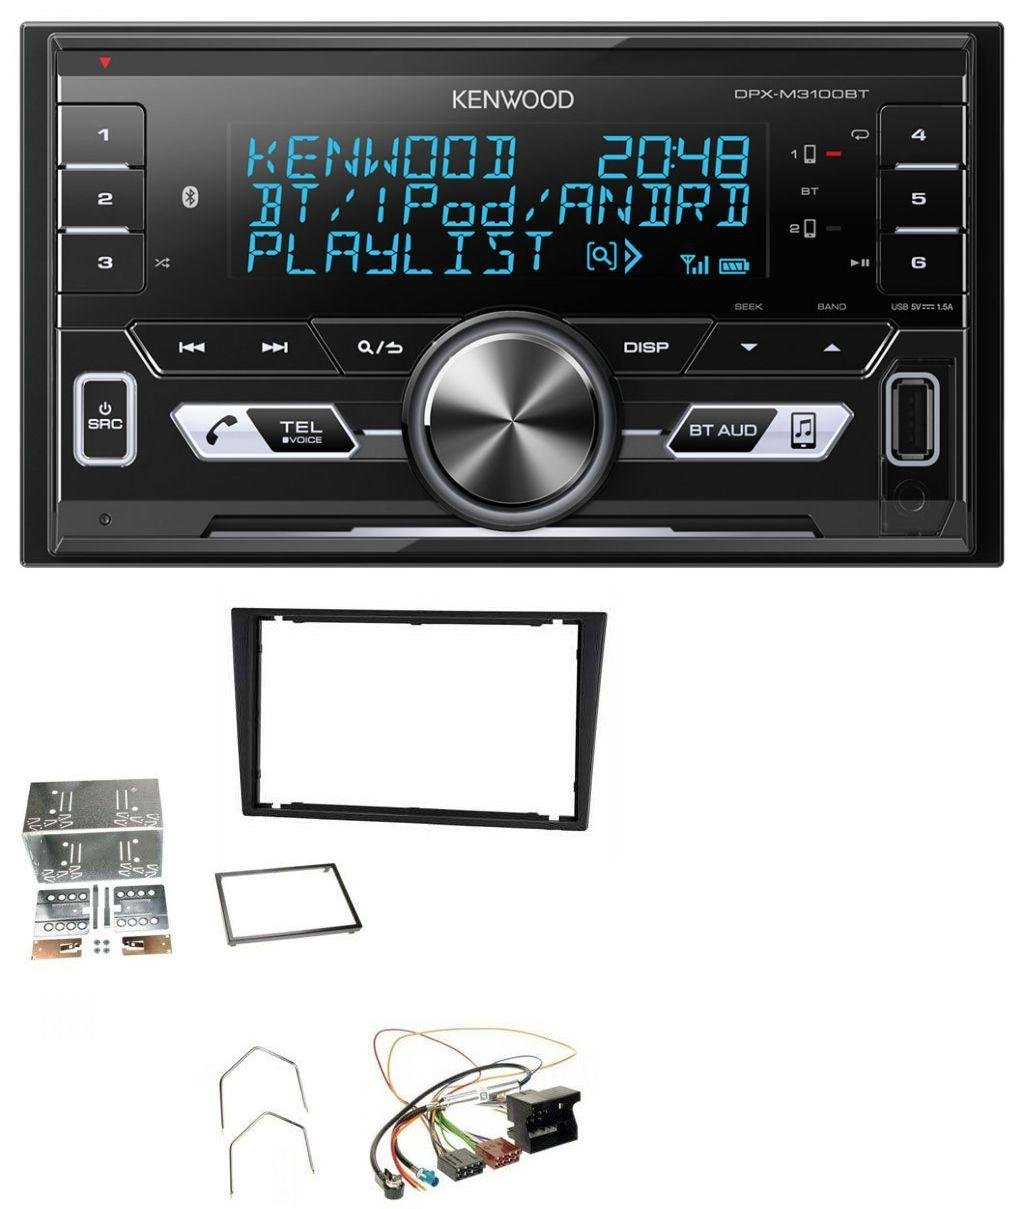 Kenwood DPX-M3100BT 2DIN Aux MP3 Bluetooth USB Autoradio fü r Opel Corsa C Signum Vectra B ab 2005 Charcoal caraudio24